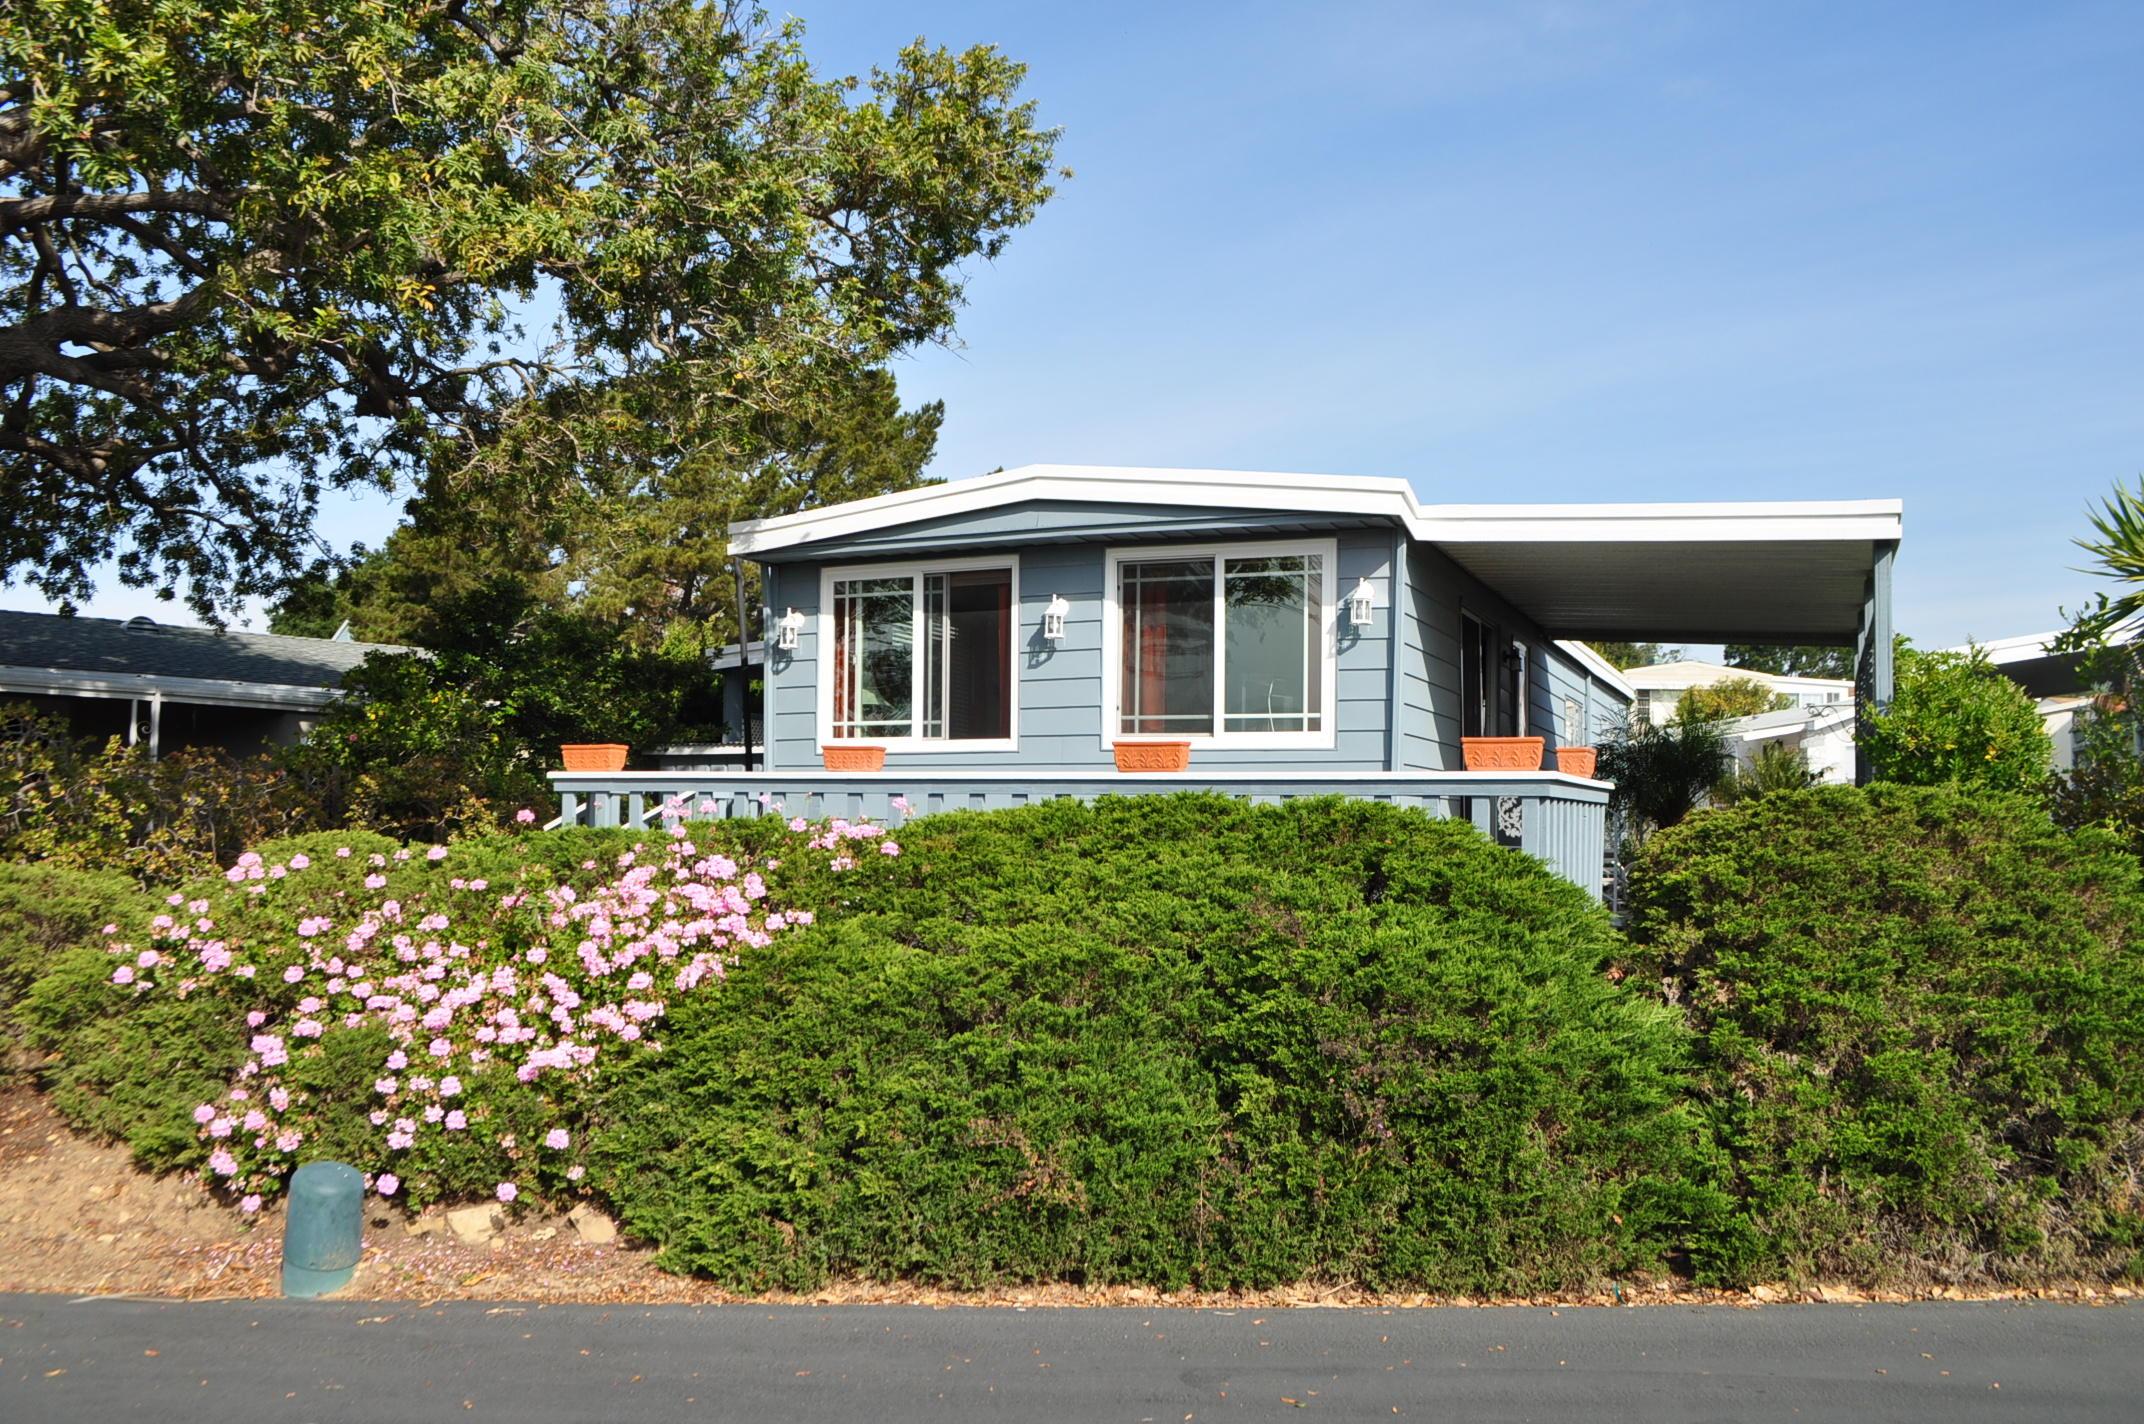 Property photo for 333 Old Mill Rd #231 Santa Barbara, California 93110 - 18-3142